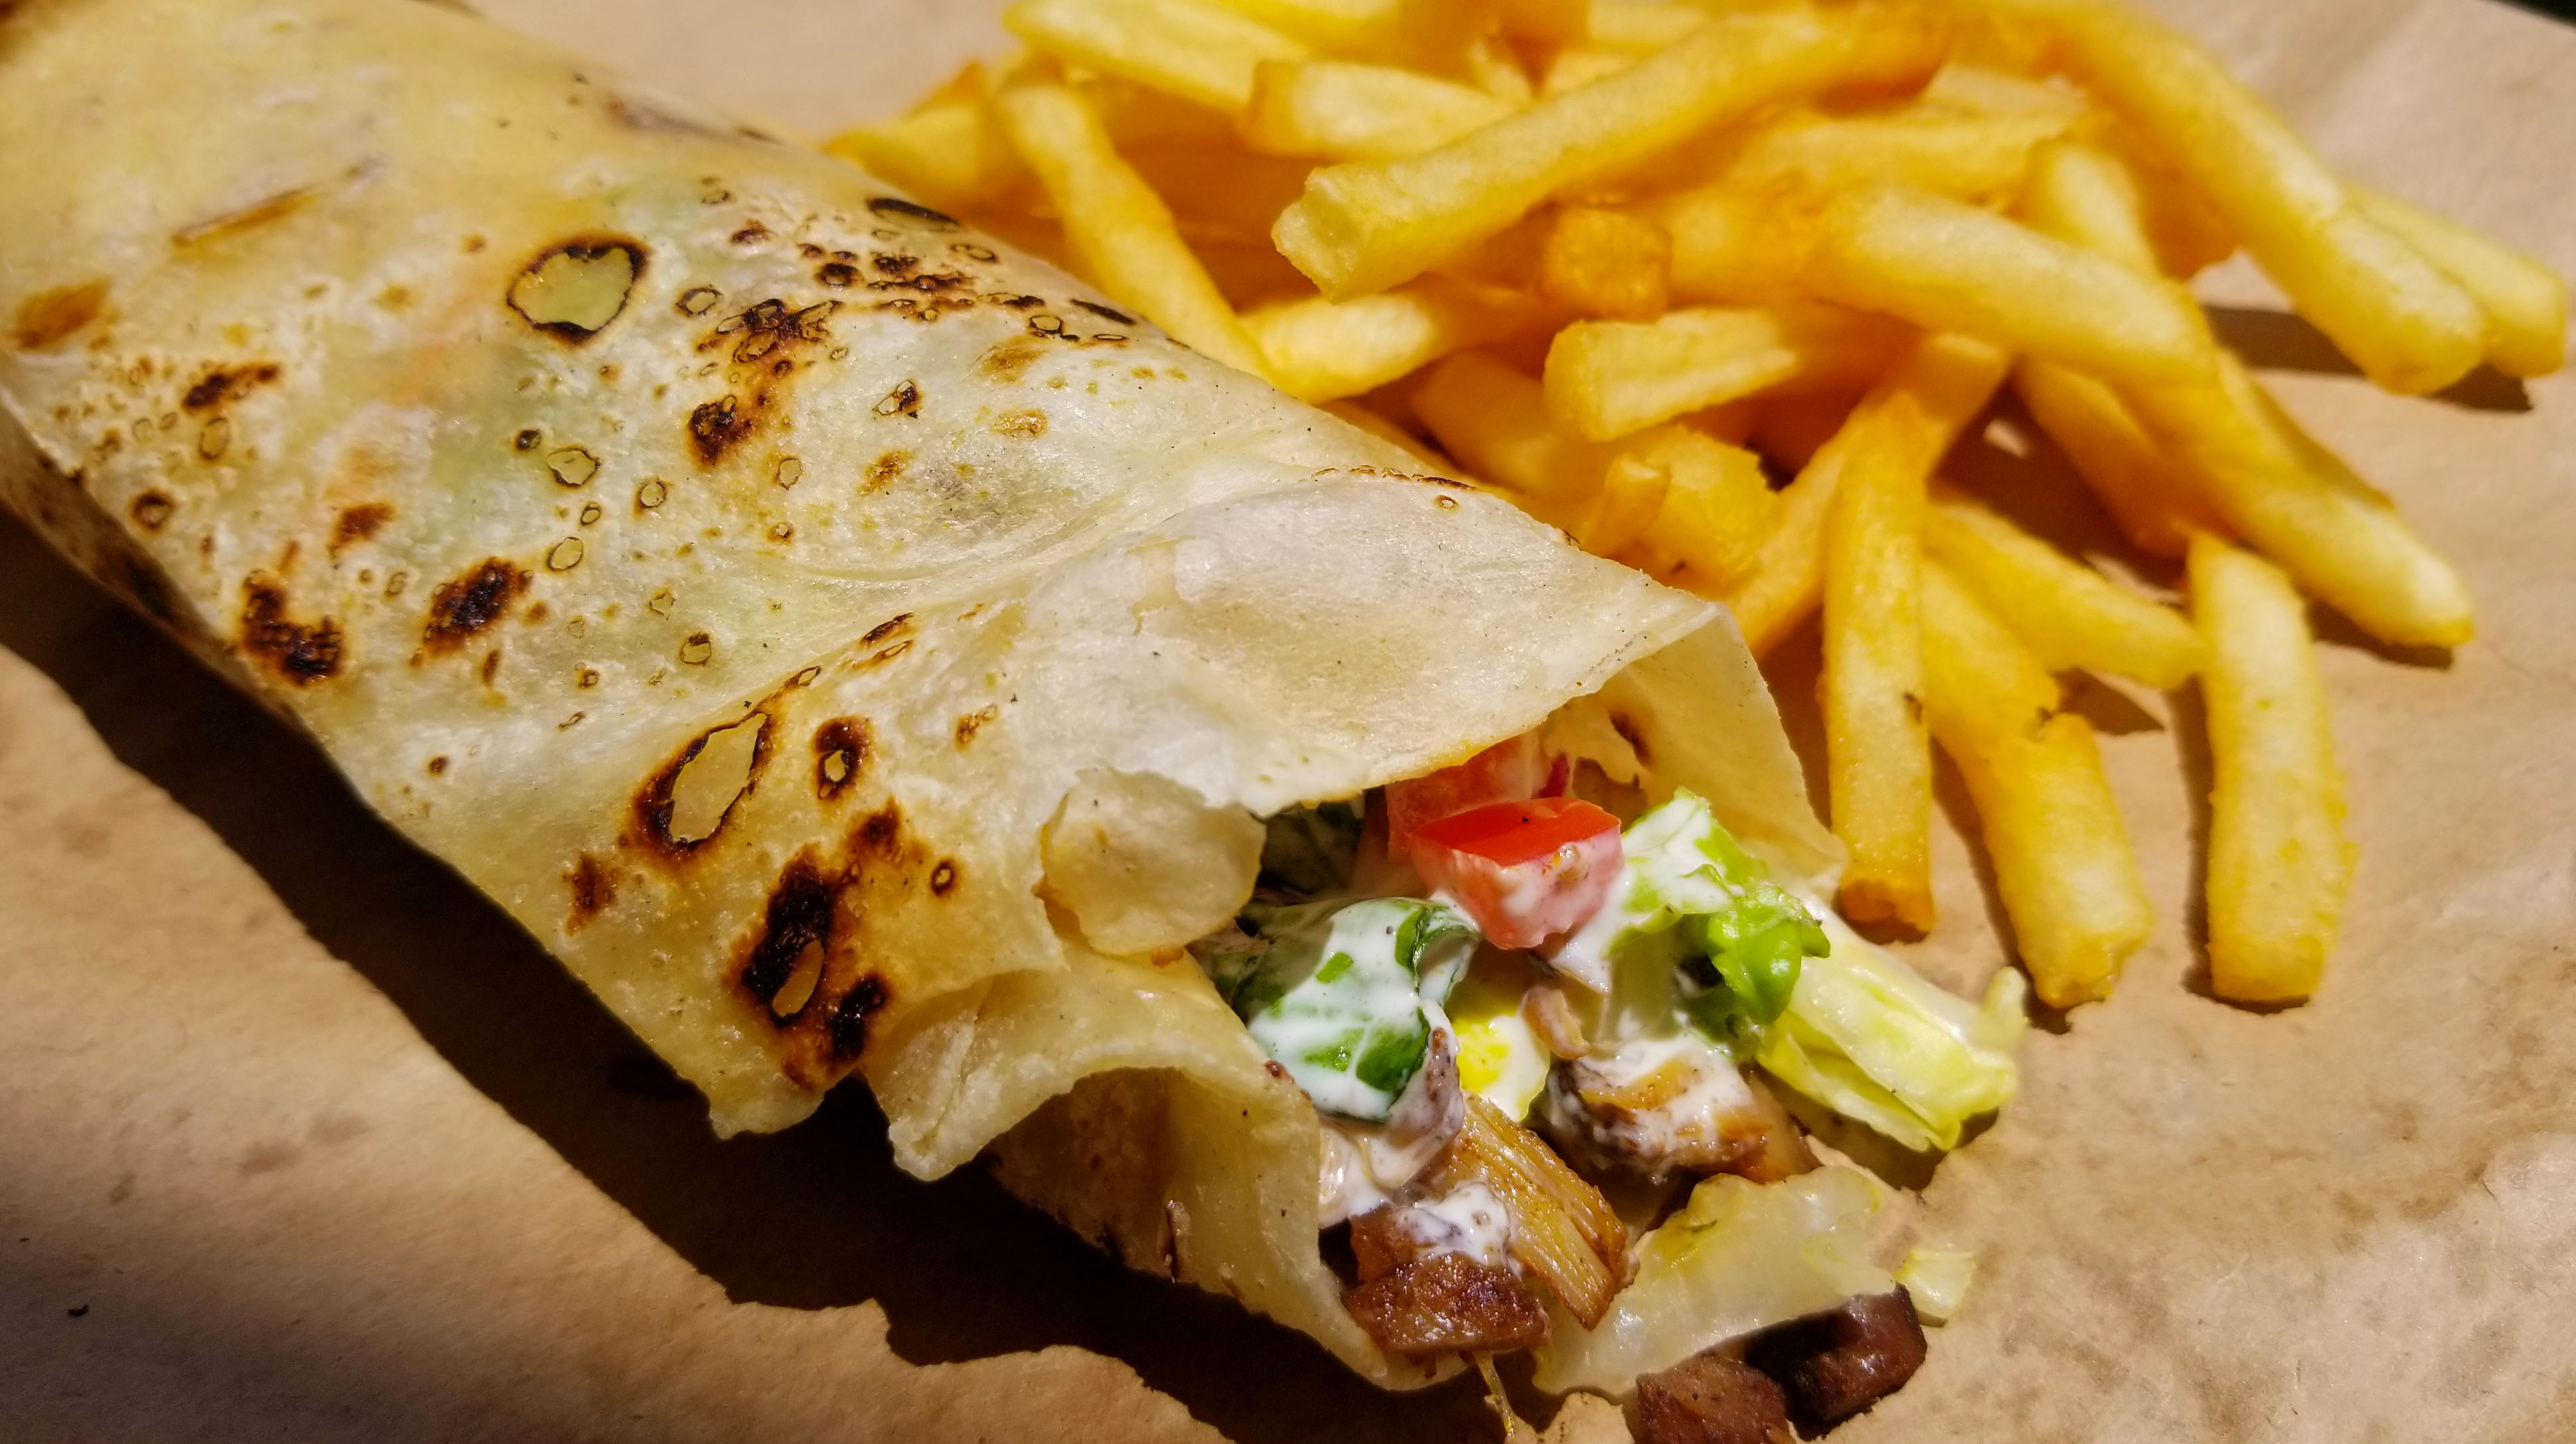 shawarma glutto digest